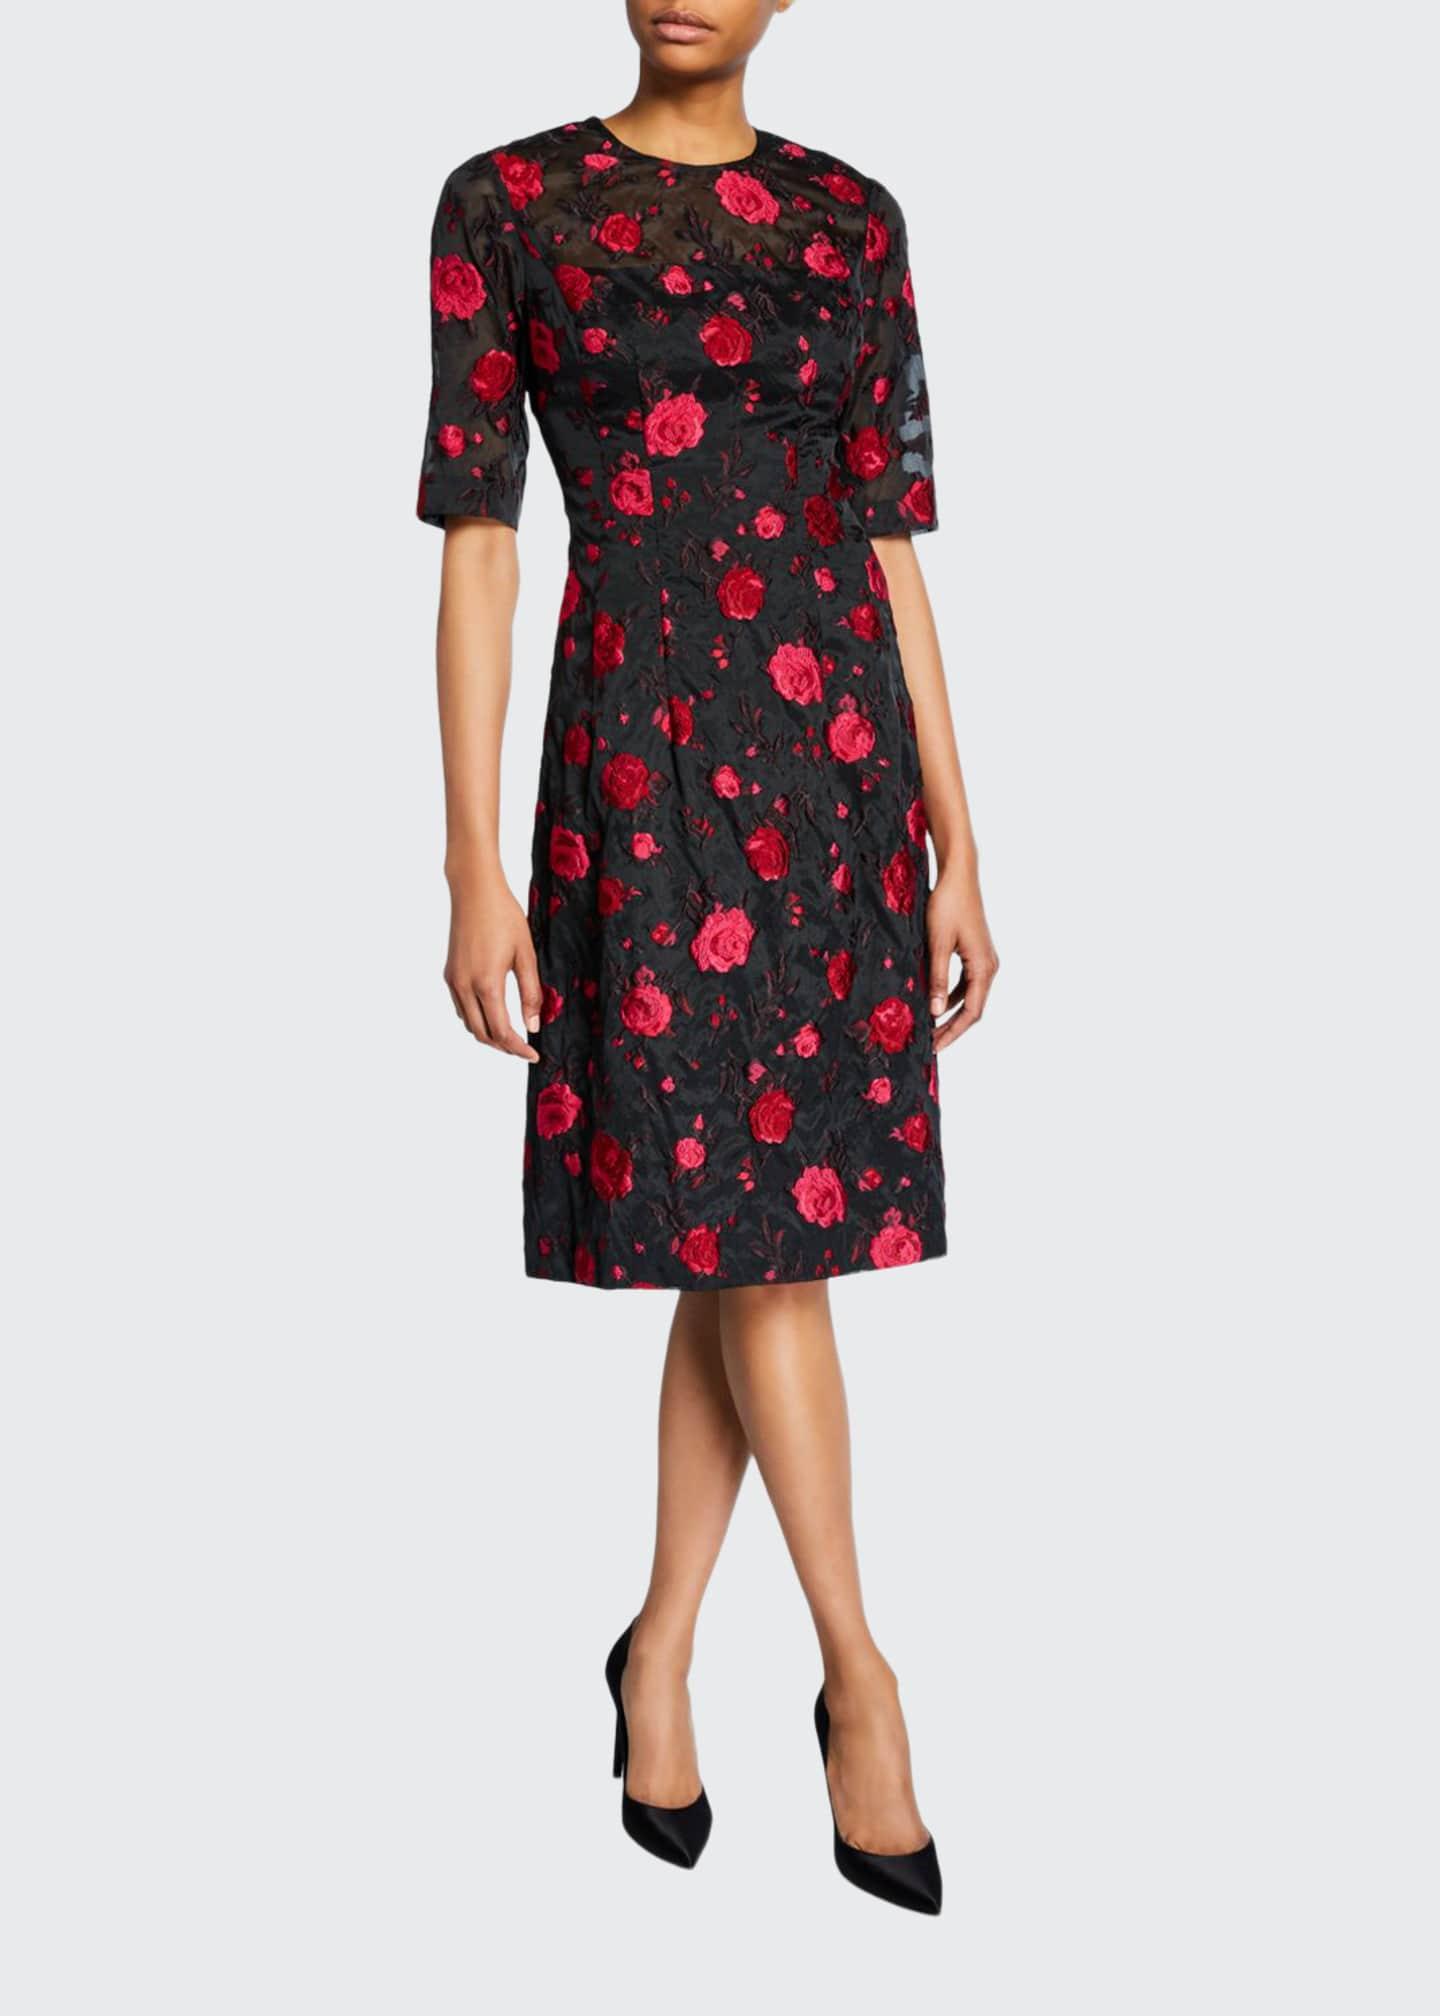 Lela Rose Holly Rose Fil Coupe Elbow-Sleeve Dress